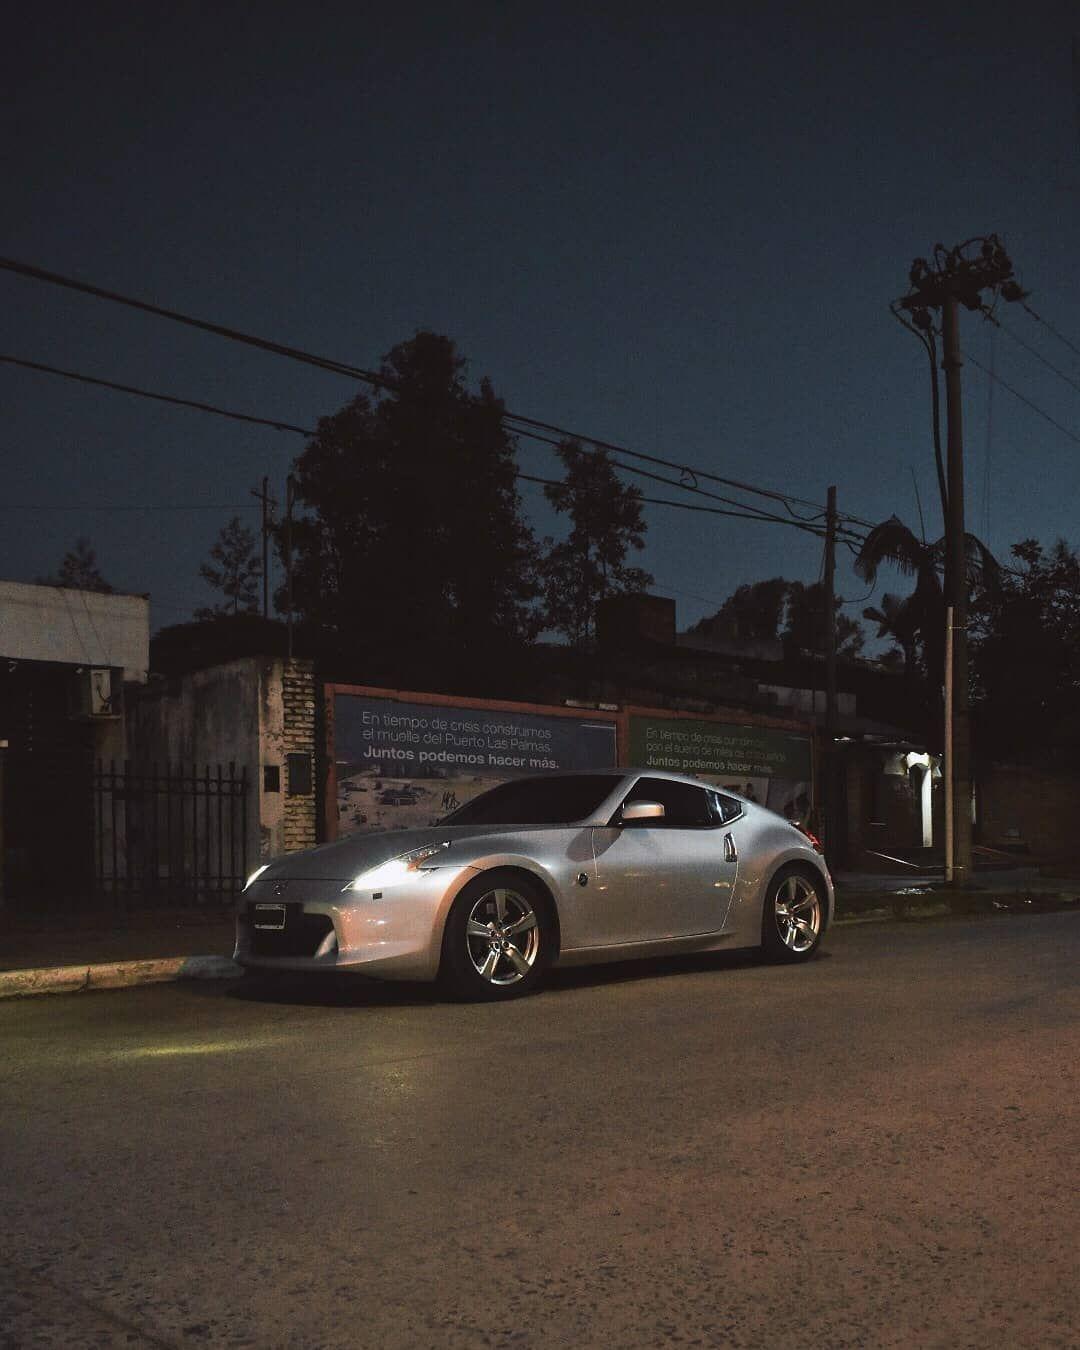 Unico 2009 Nissan 370z Ficha Tecnica Motor V6 3 7 De 331 Cv Y 366 Nm A 5200 Rpm Aliment Car Insurance Fun Diys Auto